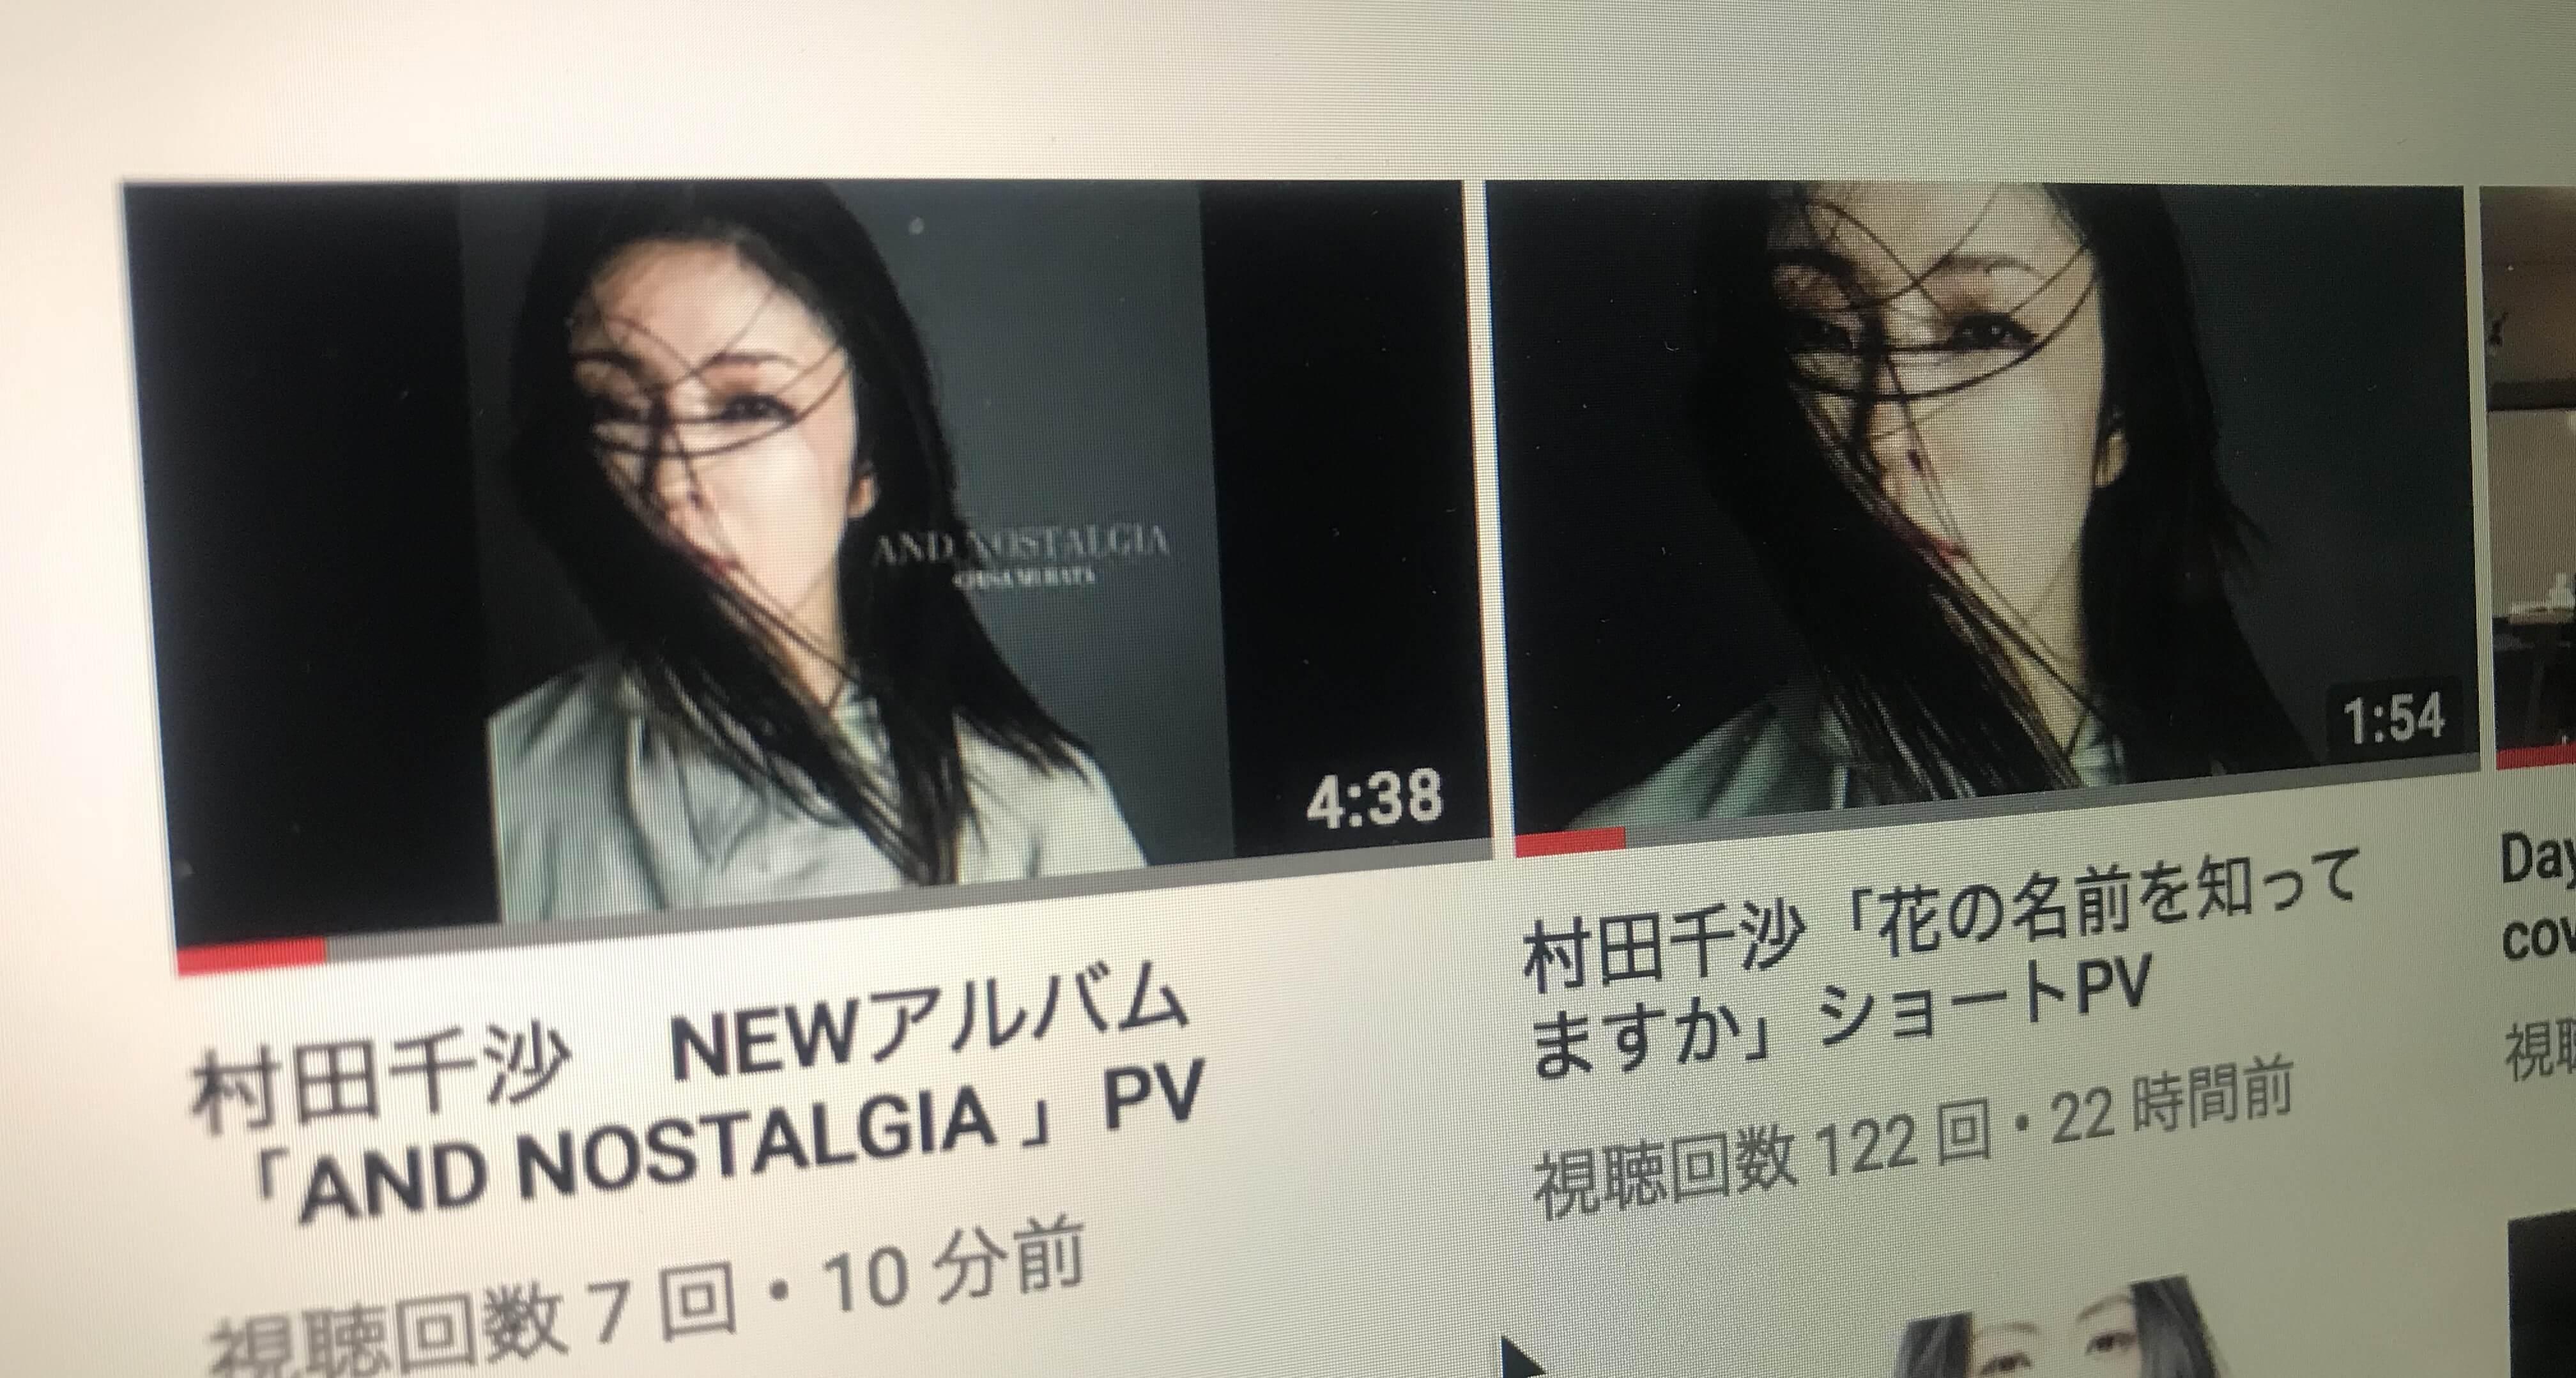 newアルバム「AND NOSTALGIA」全曲ショートPV公開